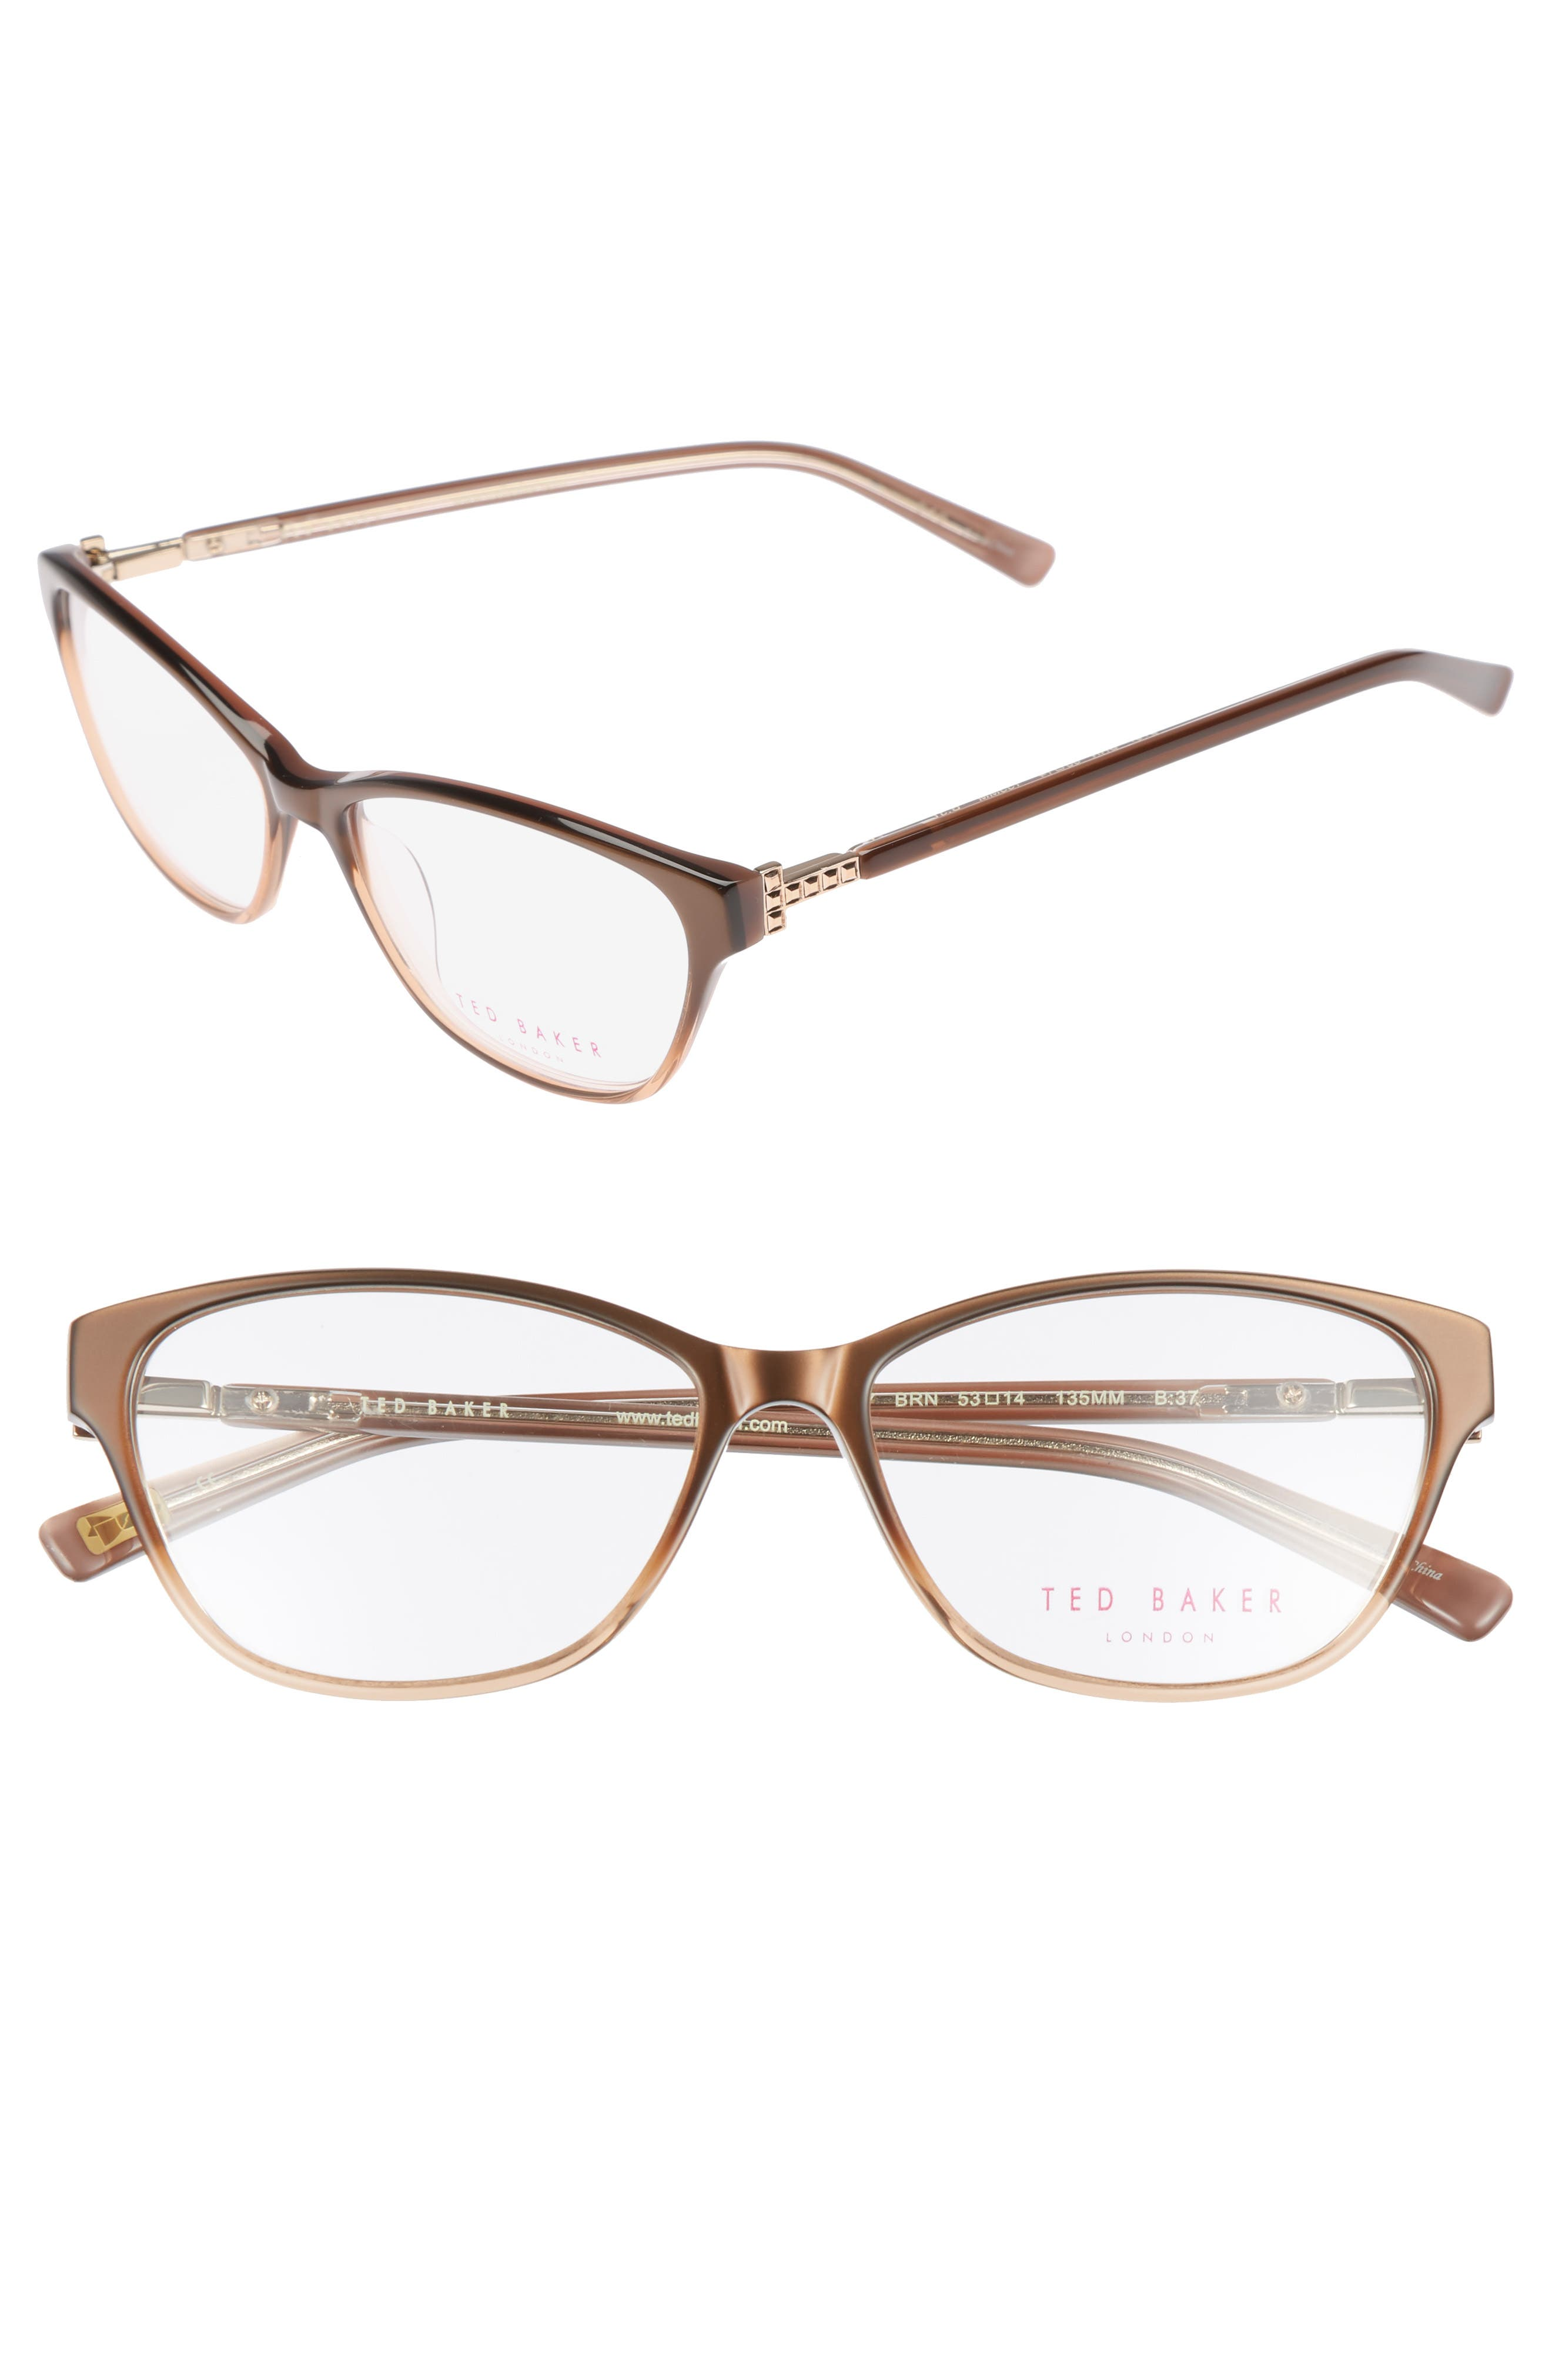 53mm Optical Cat Eye Glasses,                             Main thumbnail 1, color,                             200